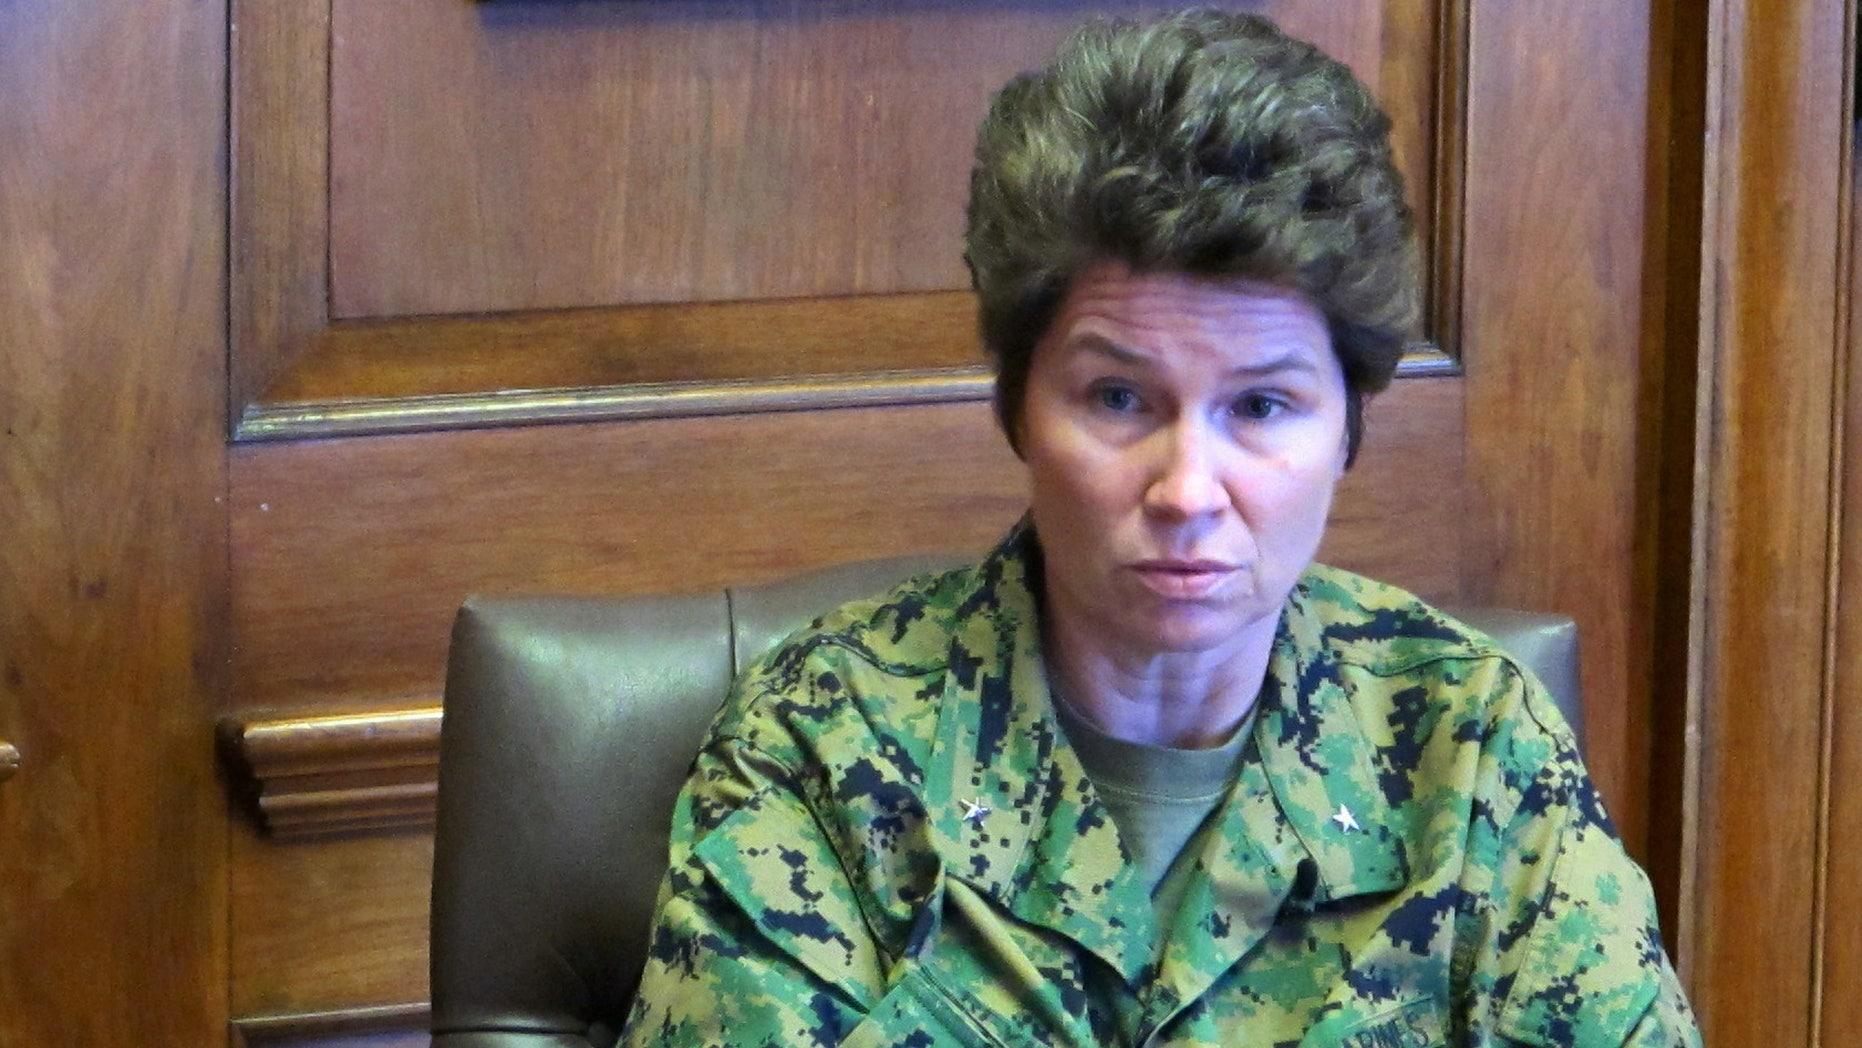 Parris Island leader says women can handle combat | Fox News